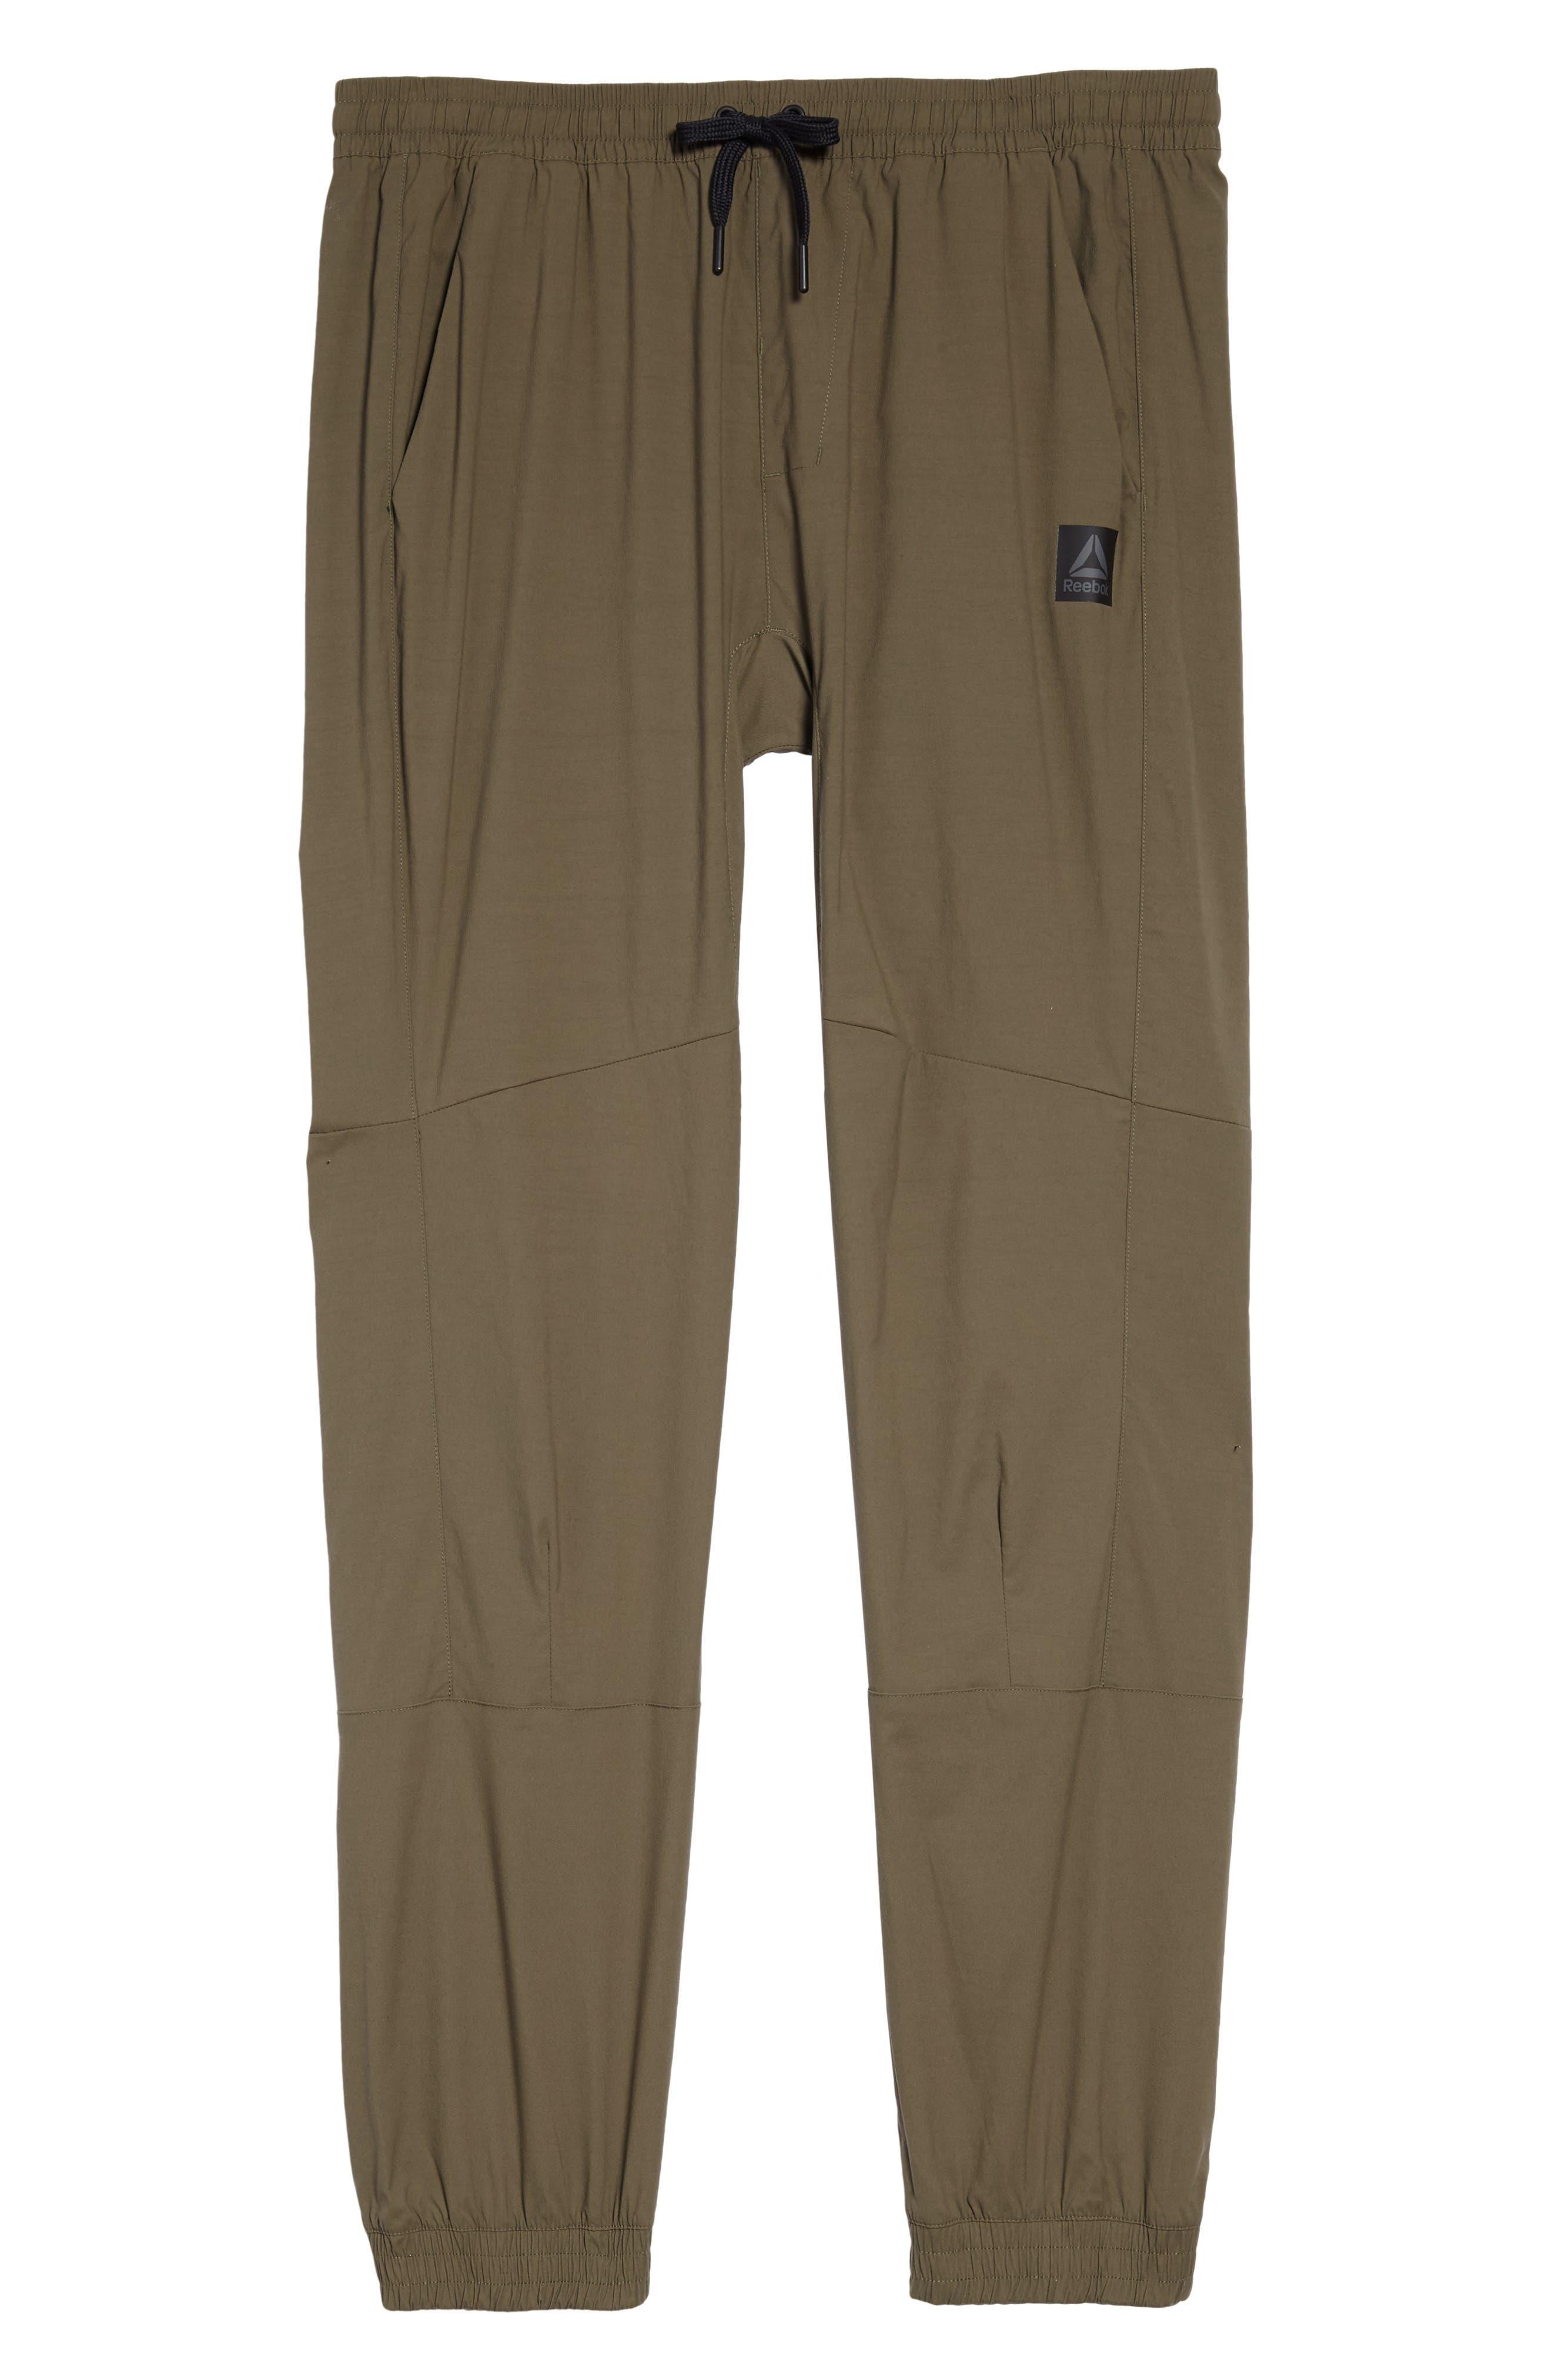 Woven Jogger Pants,                             Alternate thumbnail 6, color,                             Army Green